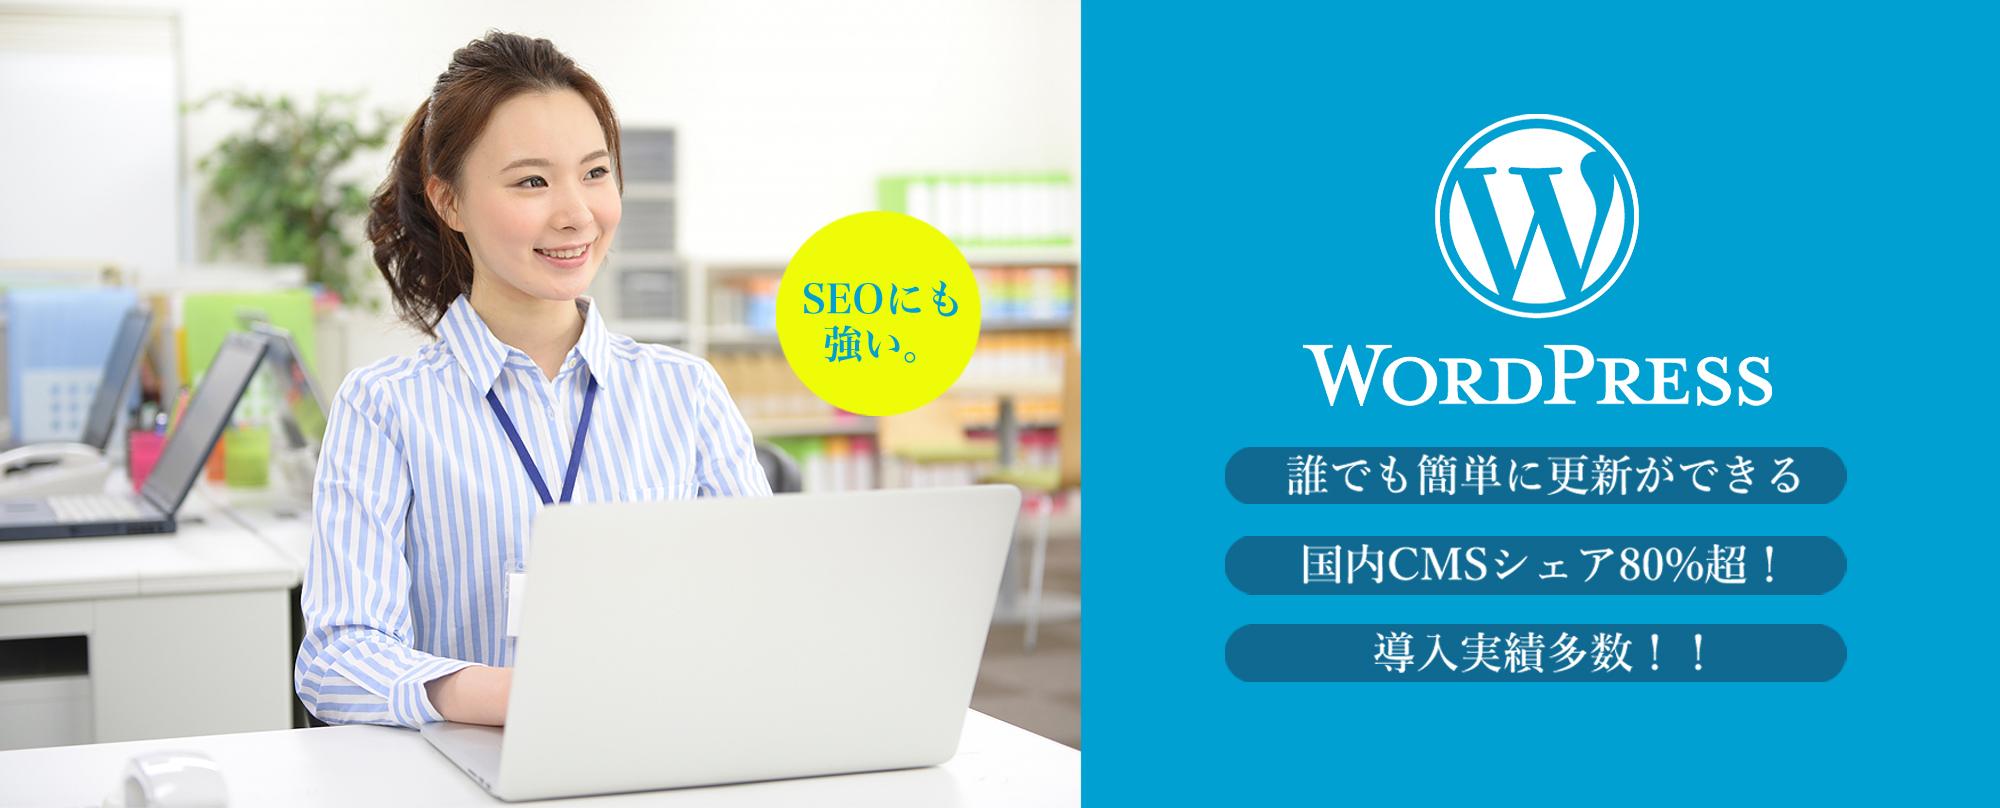 Wordpress(ワードプレス)導入実績多数!更新可能なホームページを制作いたします。